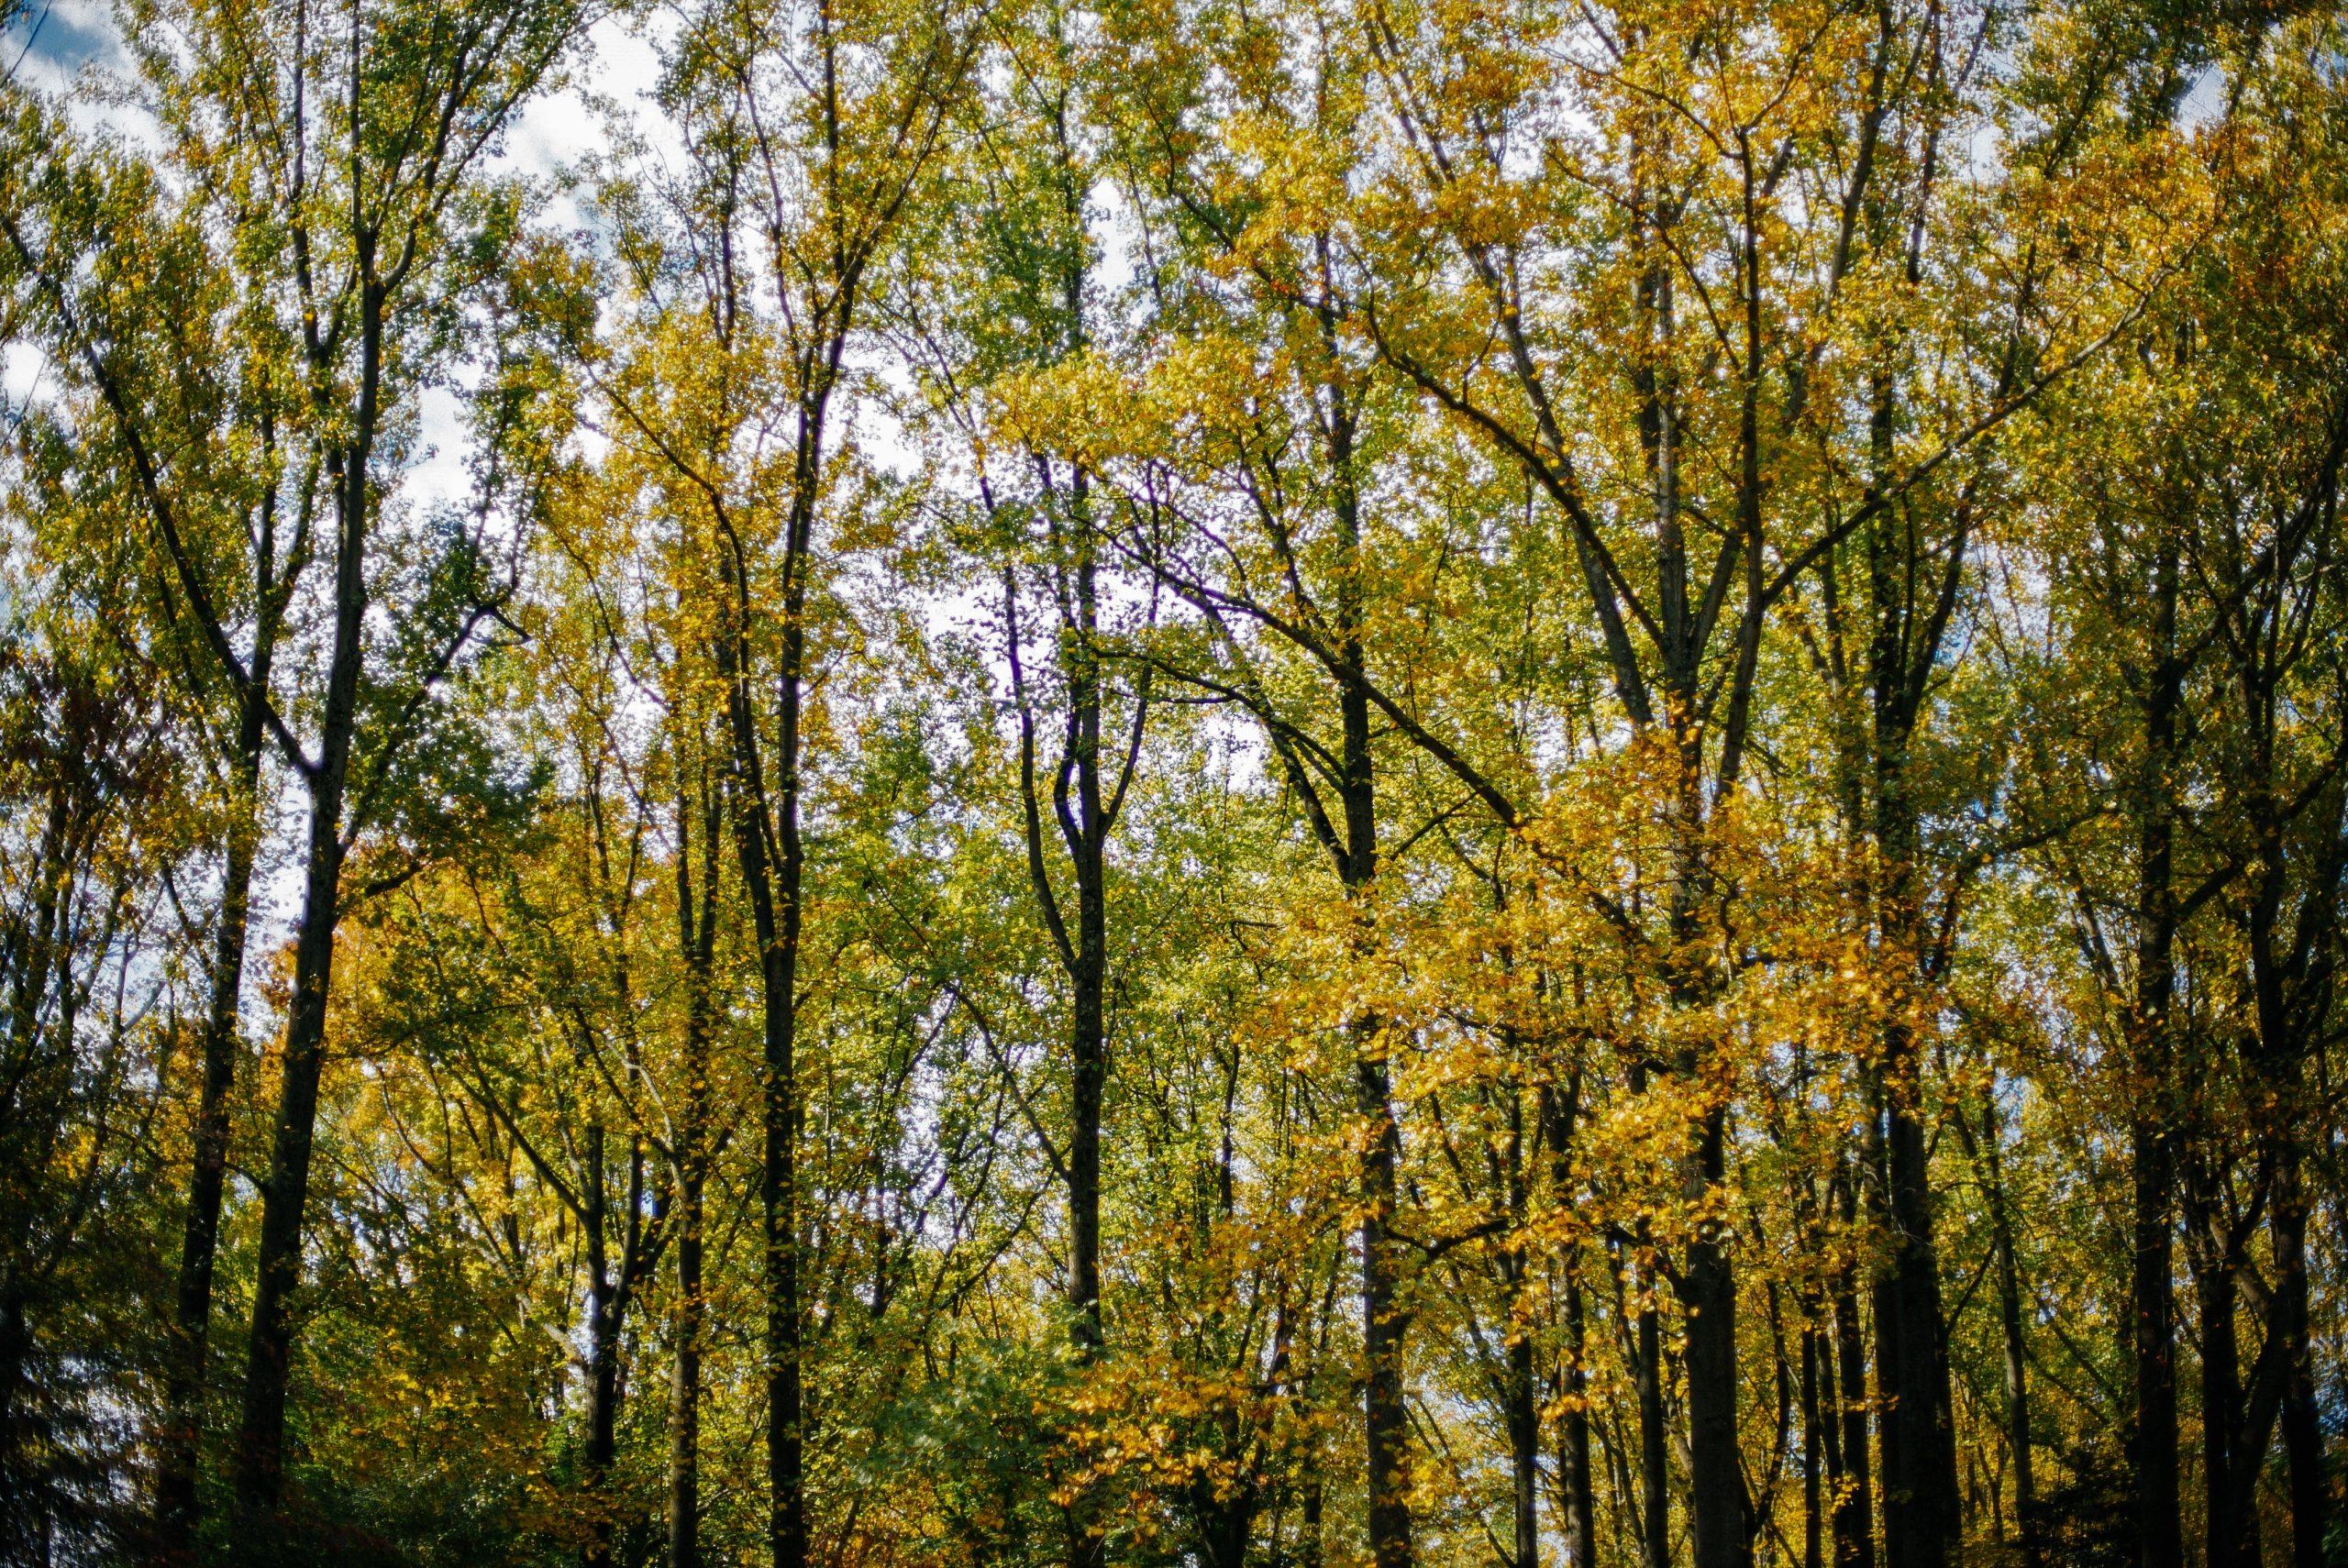 Mt. Cuba Center's woodlands in autumn